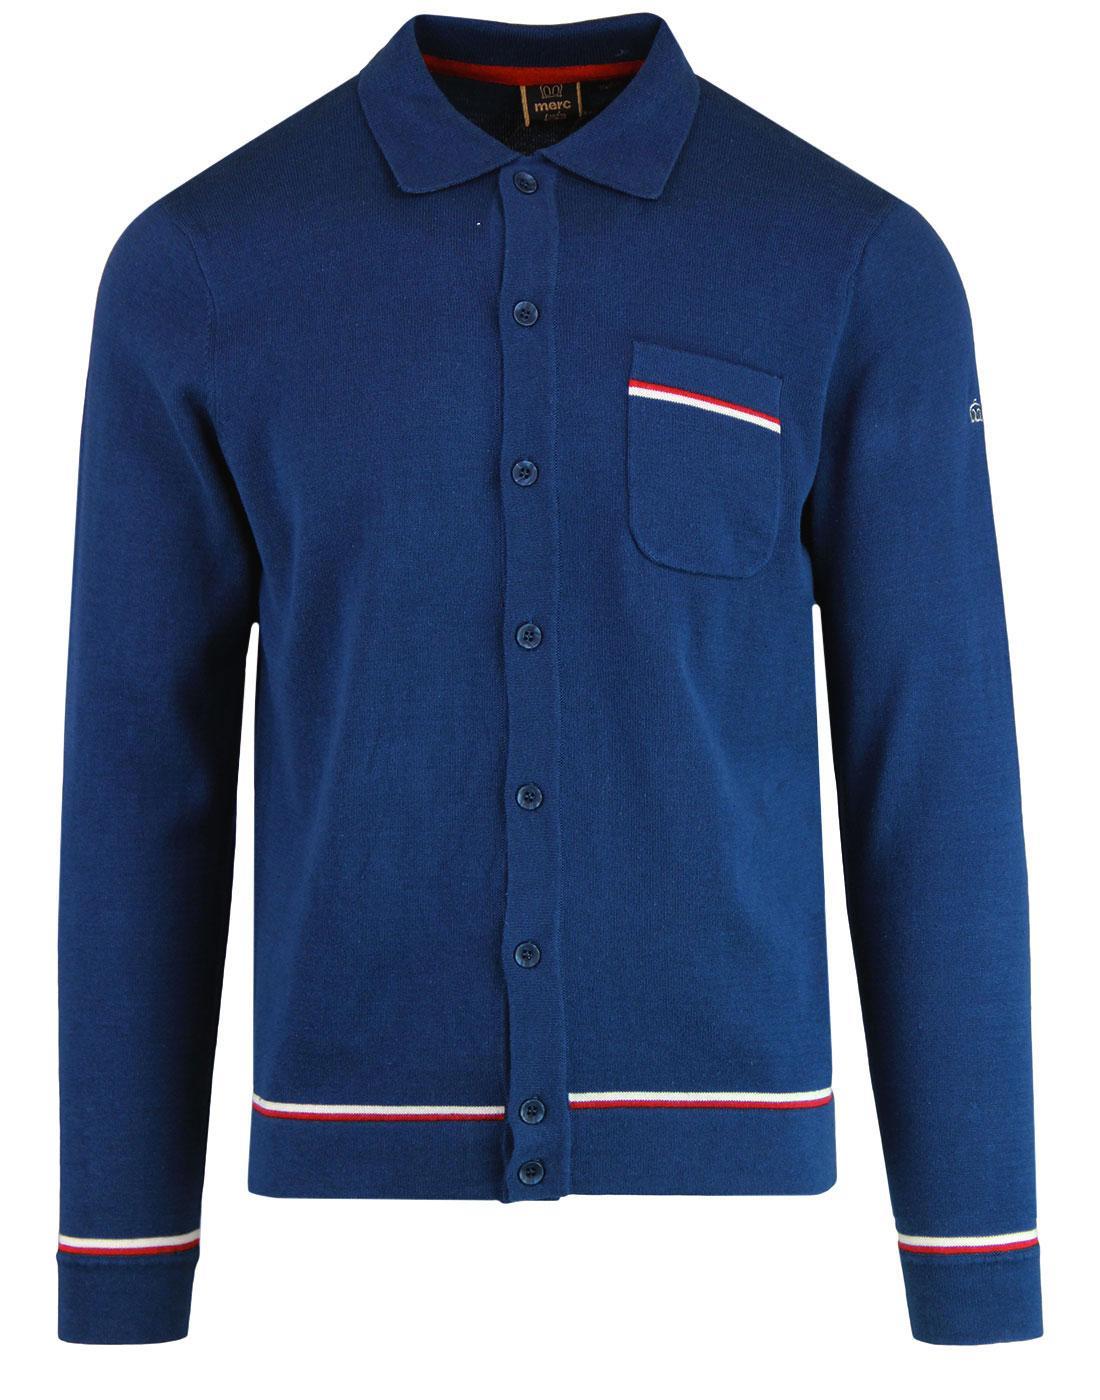 Hadwin MERC Retro 60s Mod Tipped Pocket Polo Shirt